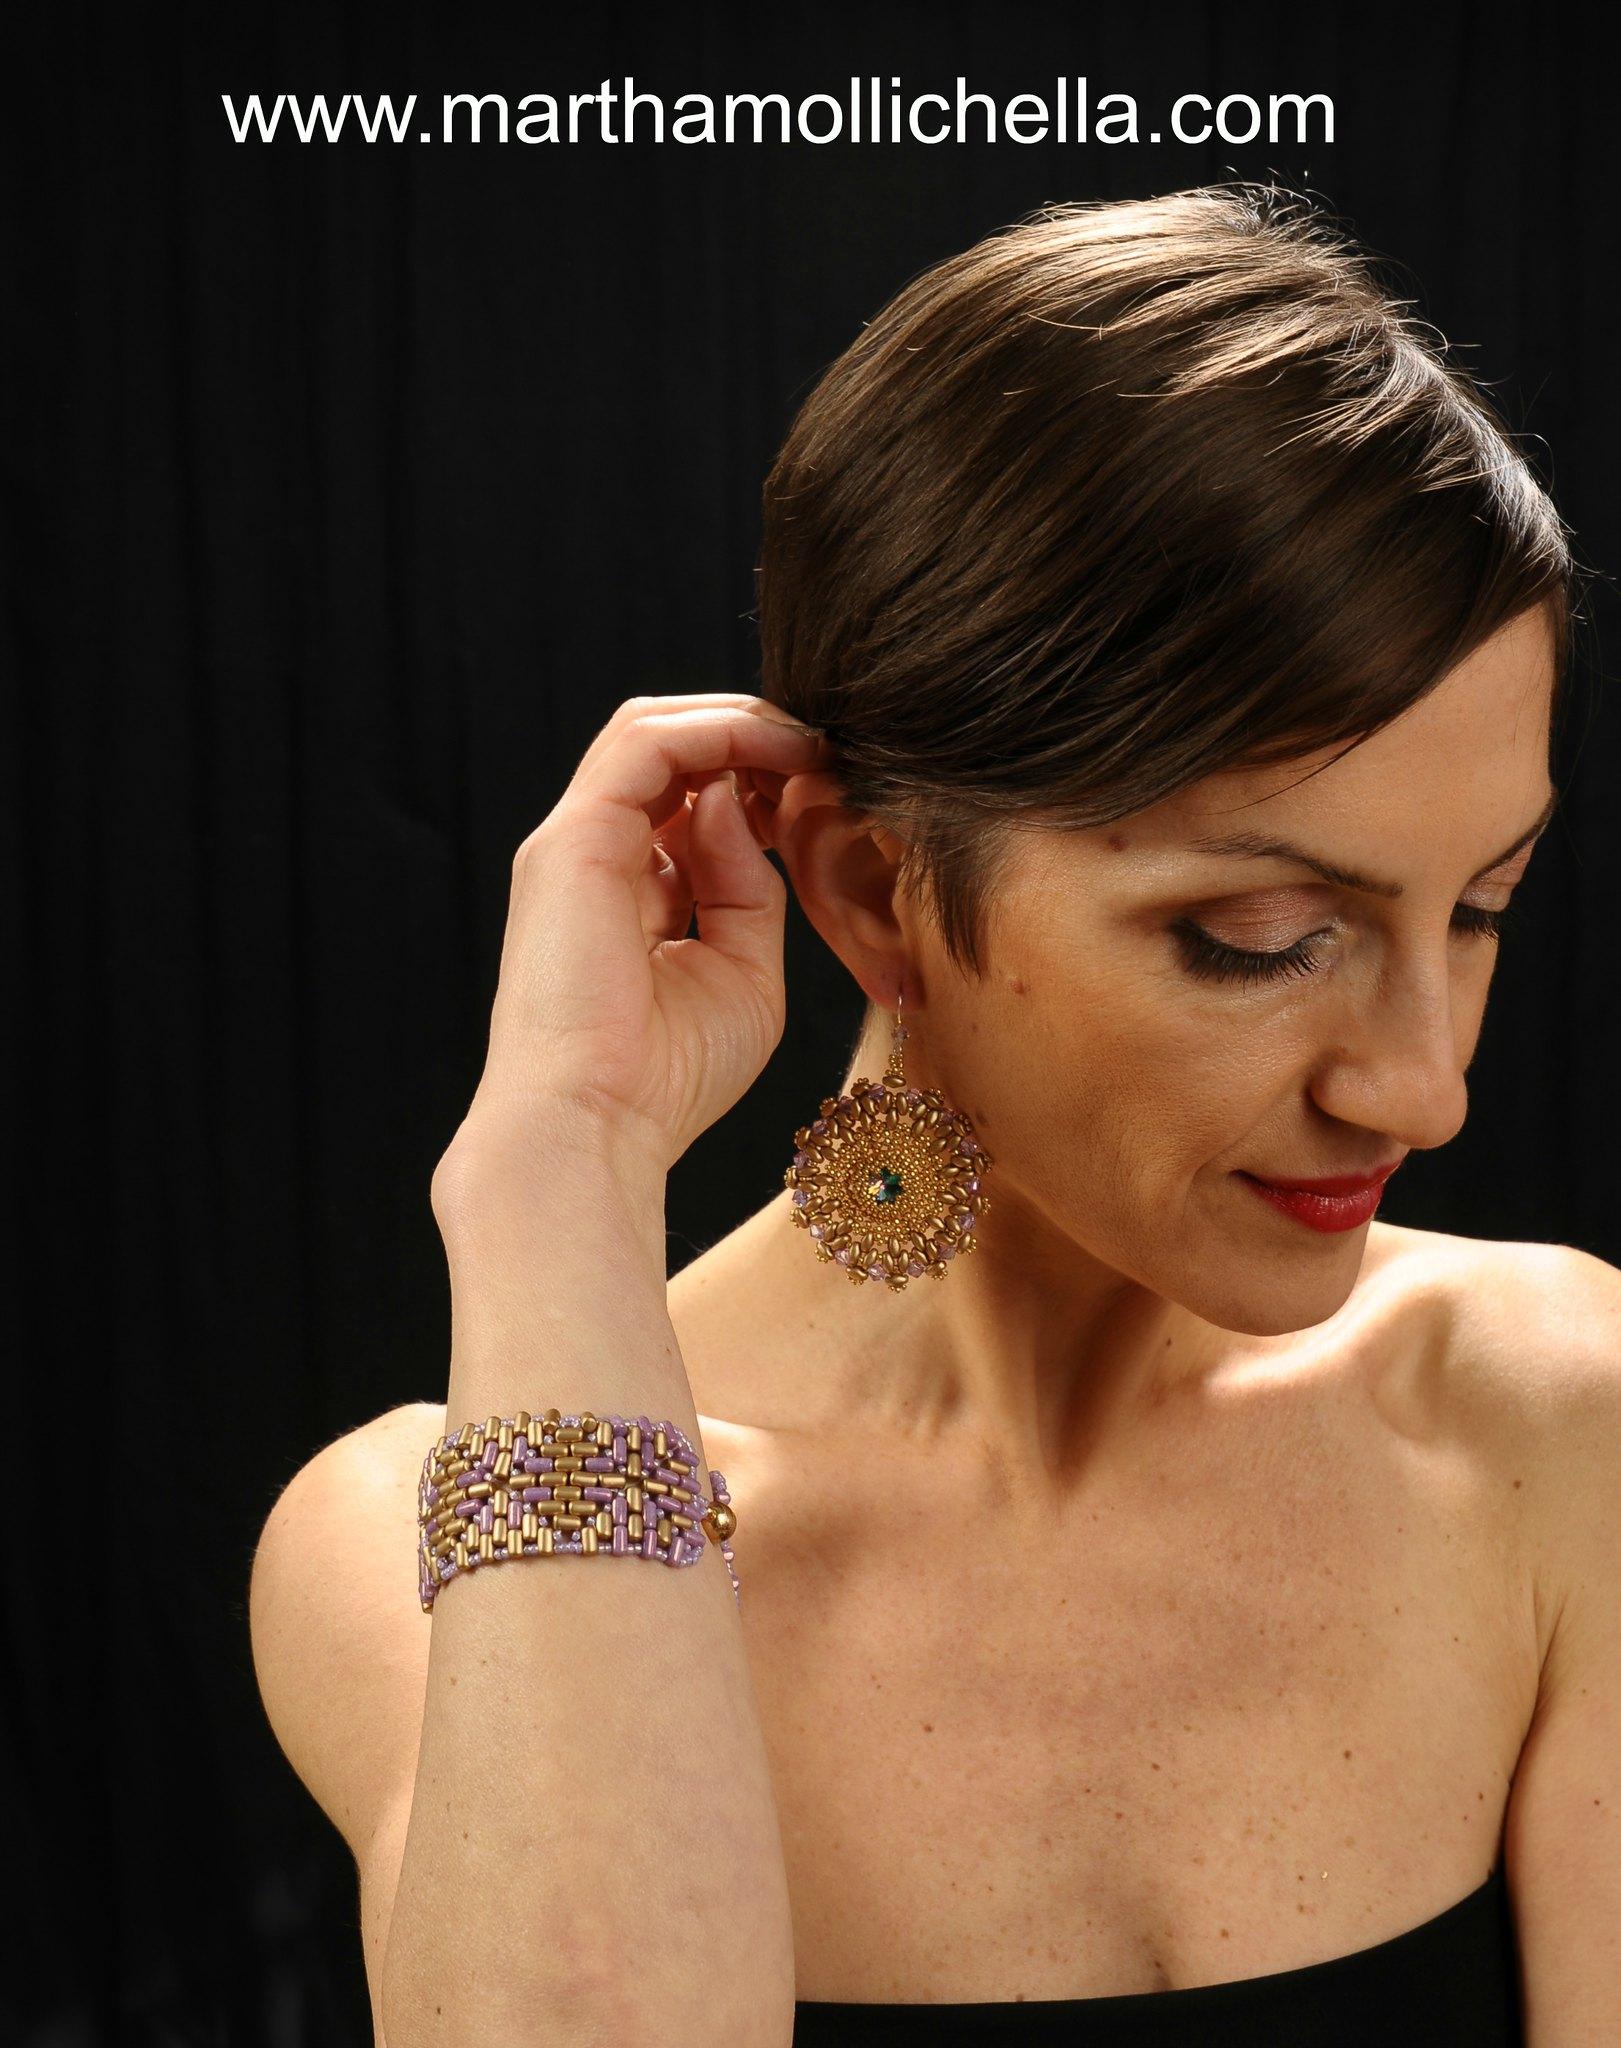 Martha Mollichella Handmade Jewelry Jewellery made in Italy with love